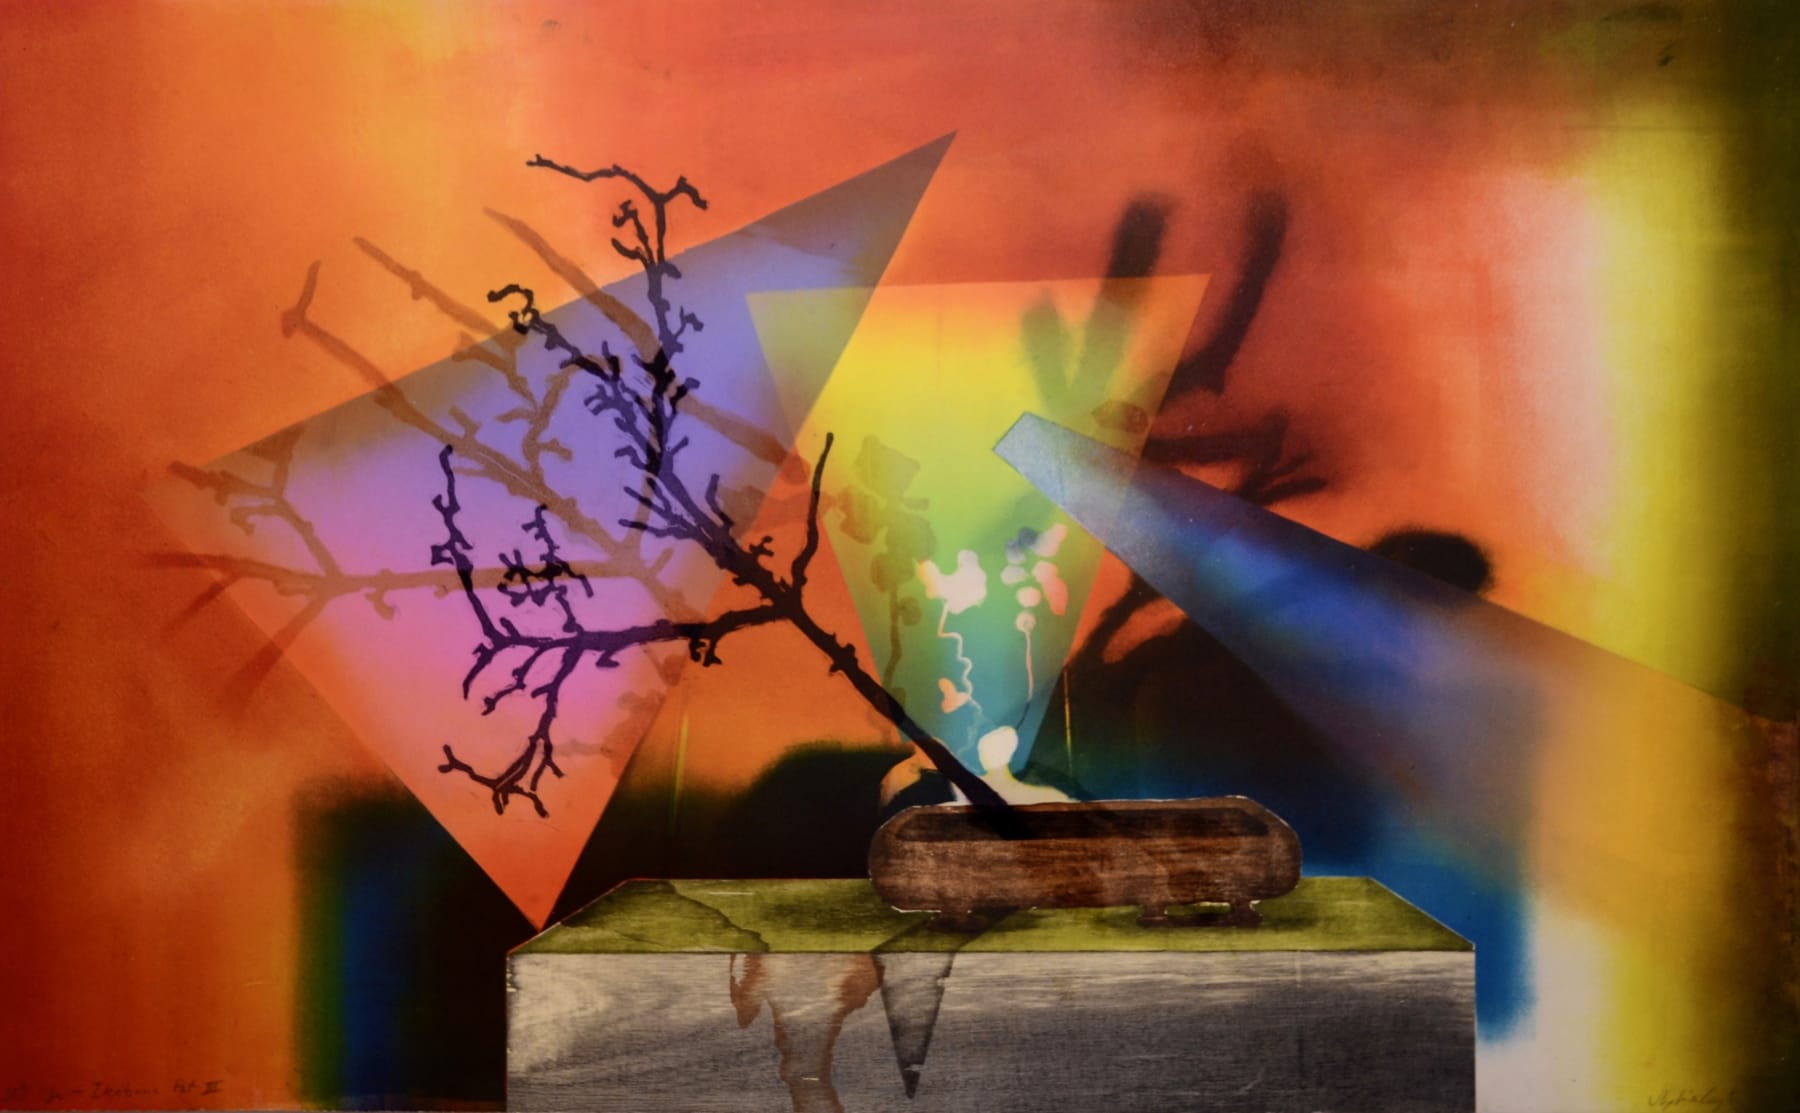 Sophie Layton, Still Life - Ikebana Pot III, 2019